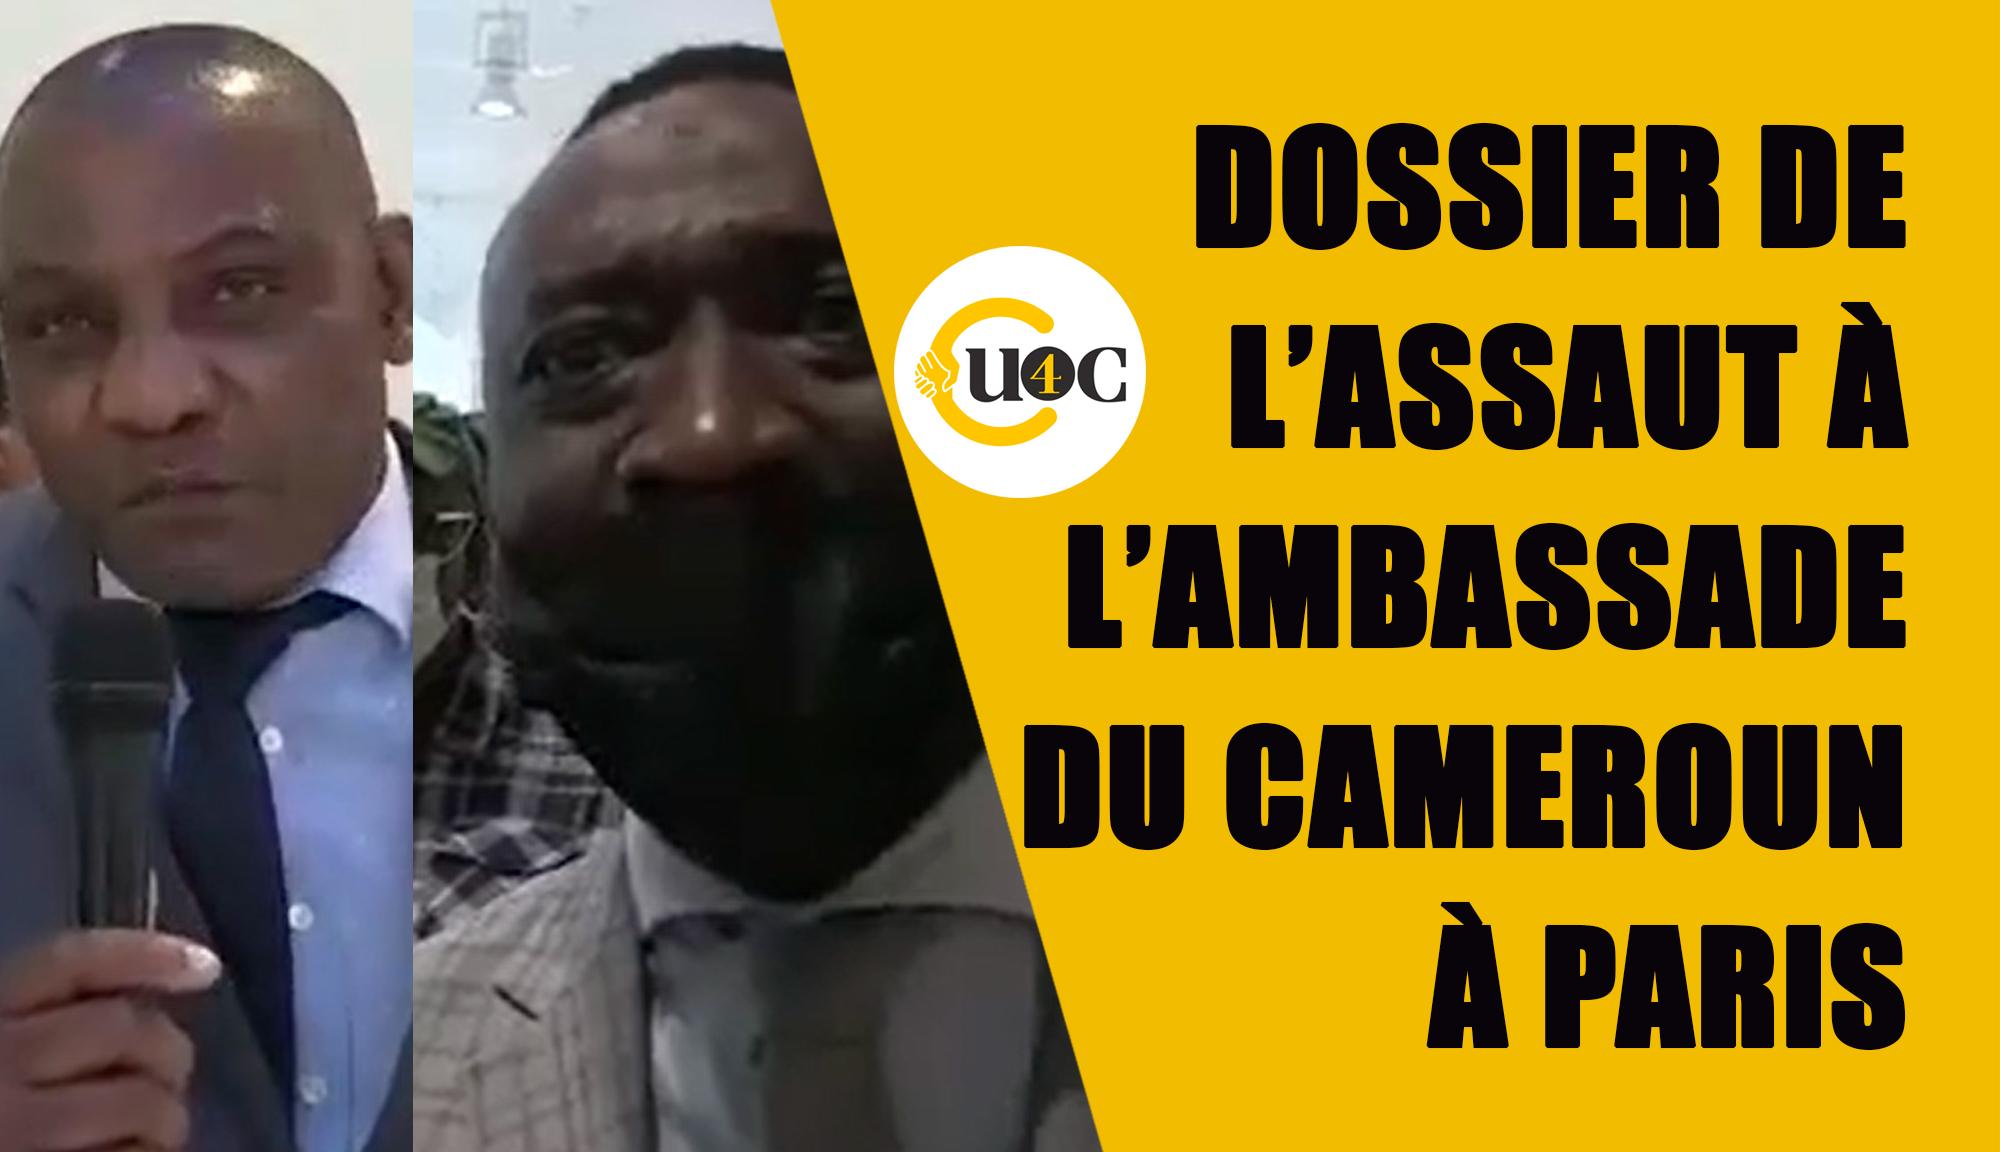 Dossier de l'assaut de  l'ambassade du Cameroun à Paris